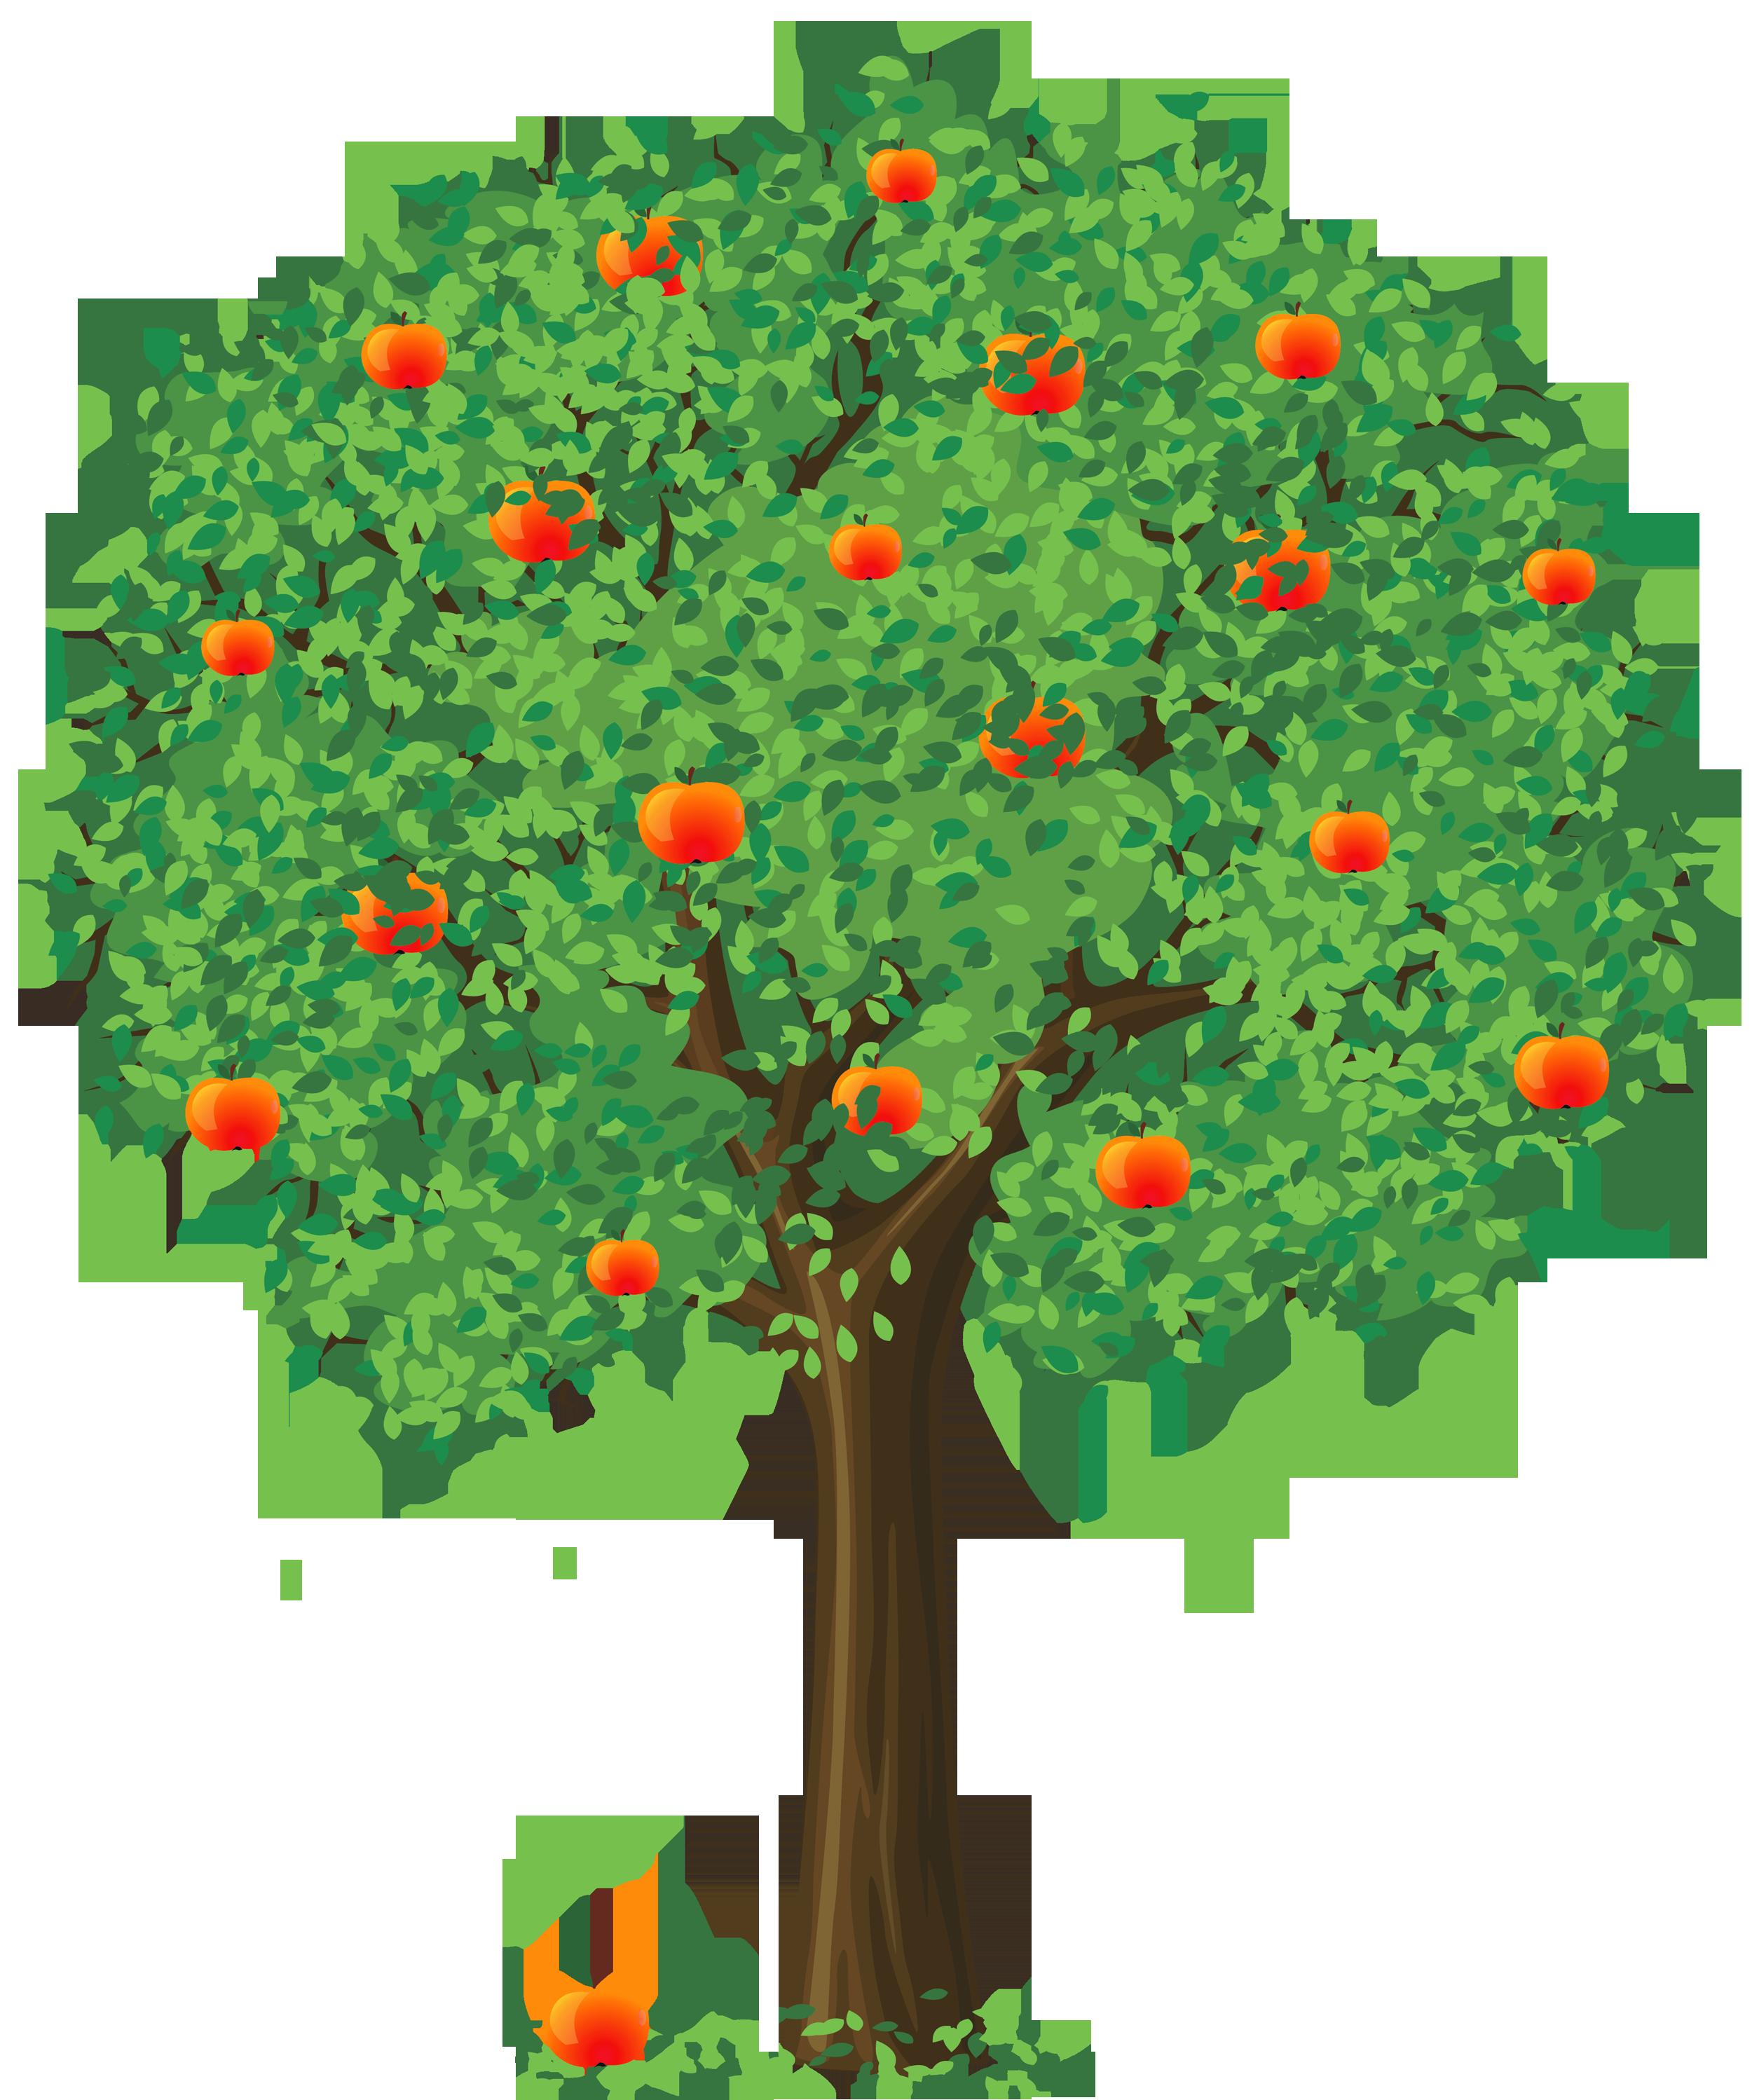 Tree clipart santol #10